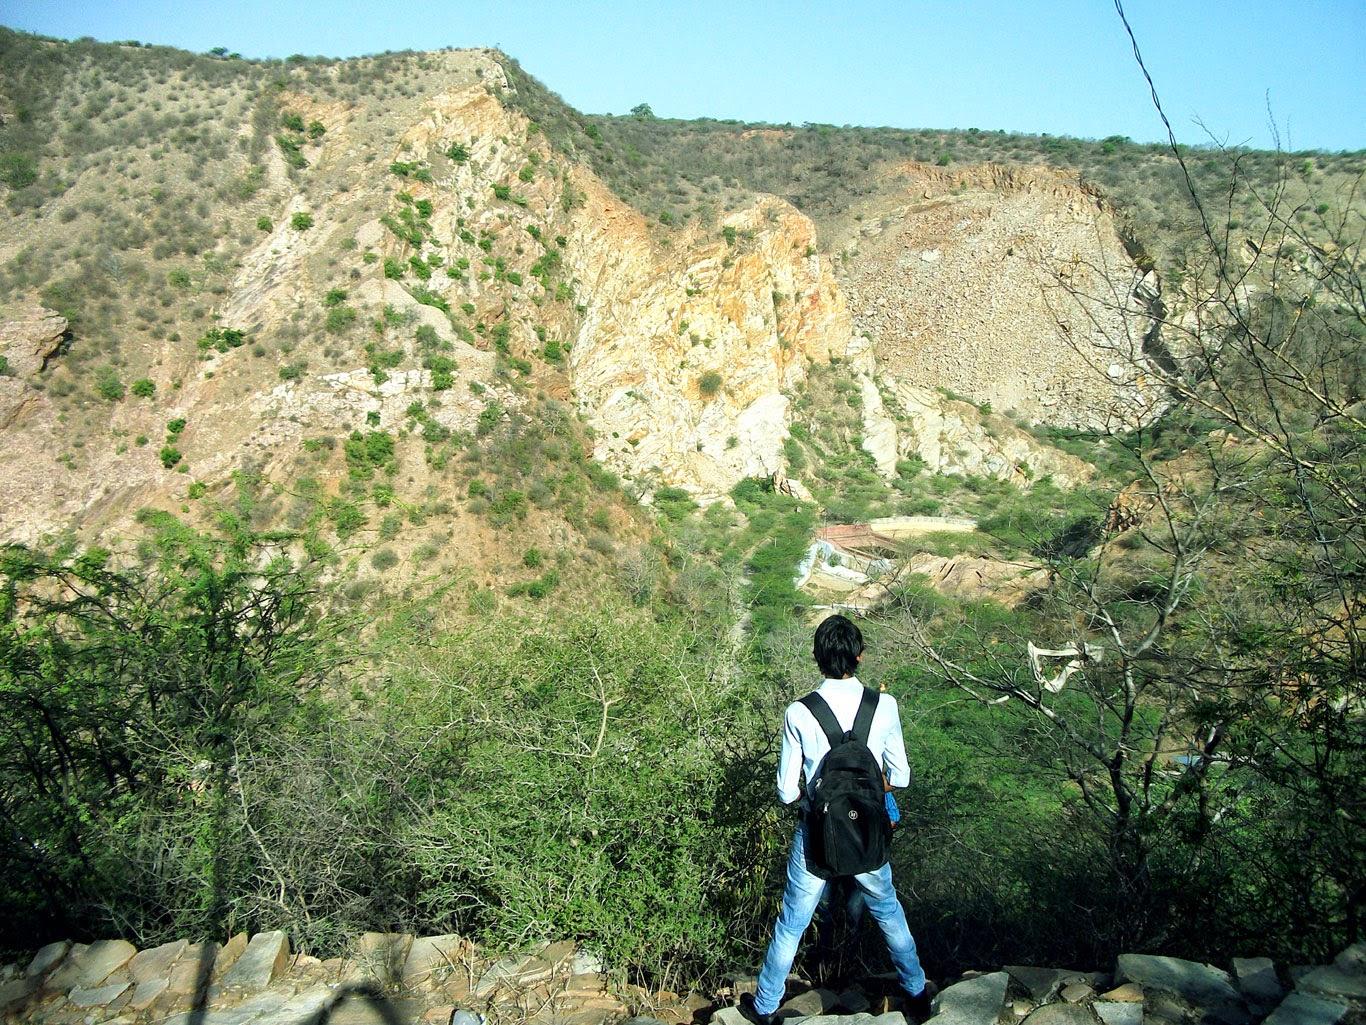 Gad ganesh jaipur valley 01